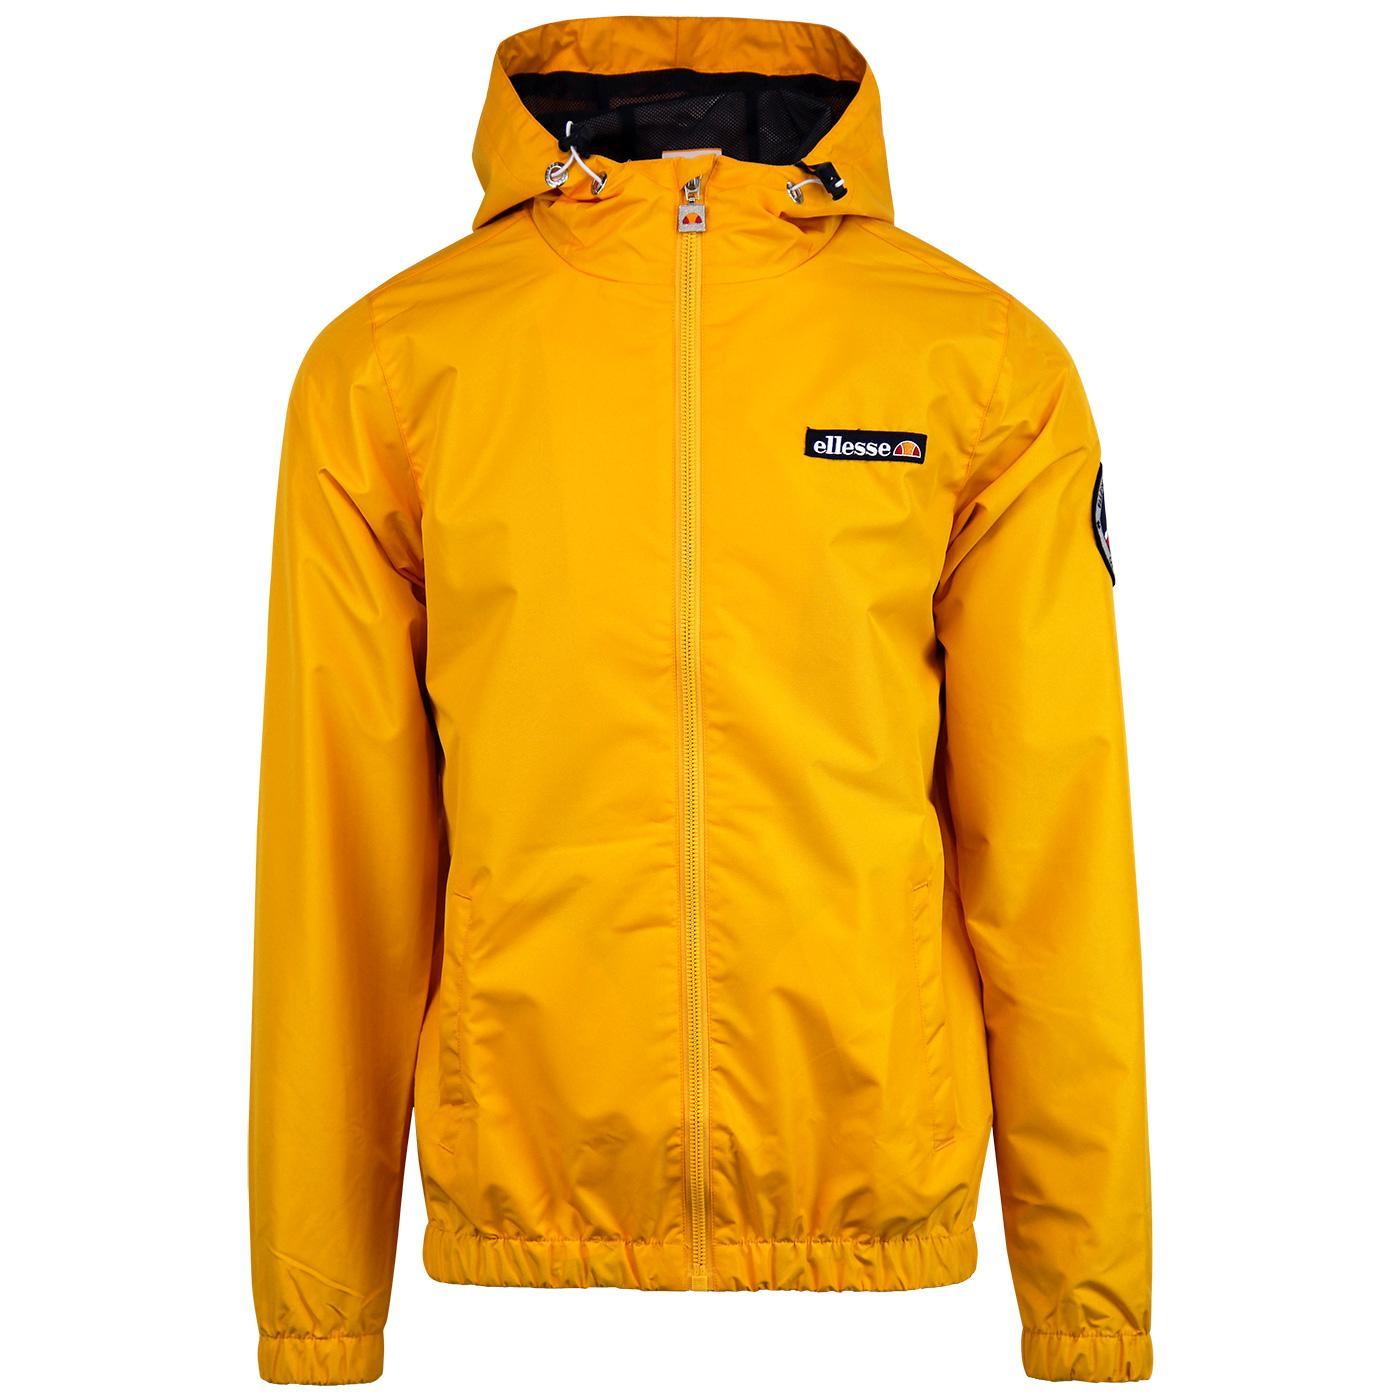 Terrazzo ELLESSE 80's Hooded Ski Jacket - Citrus